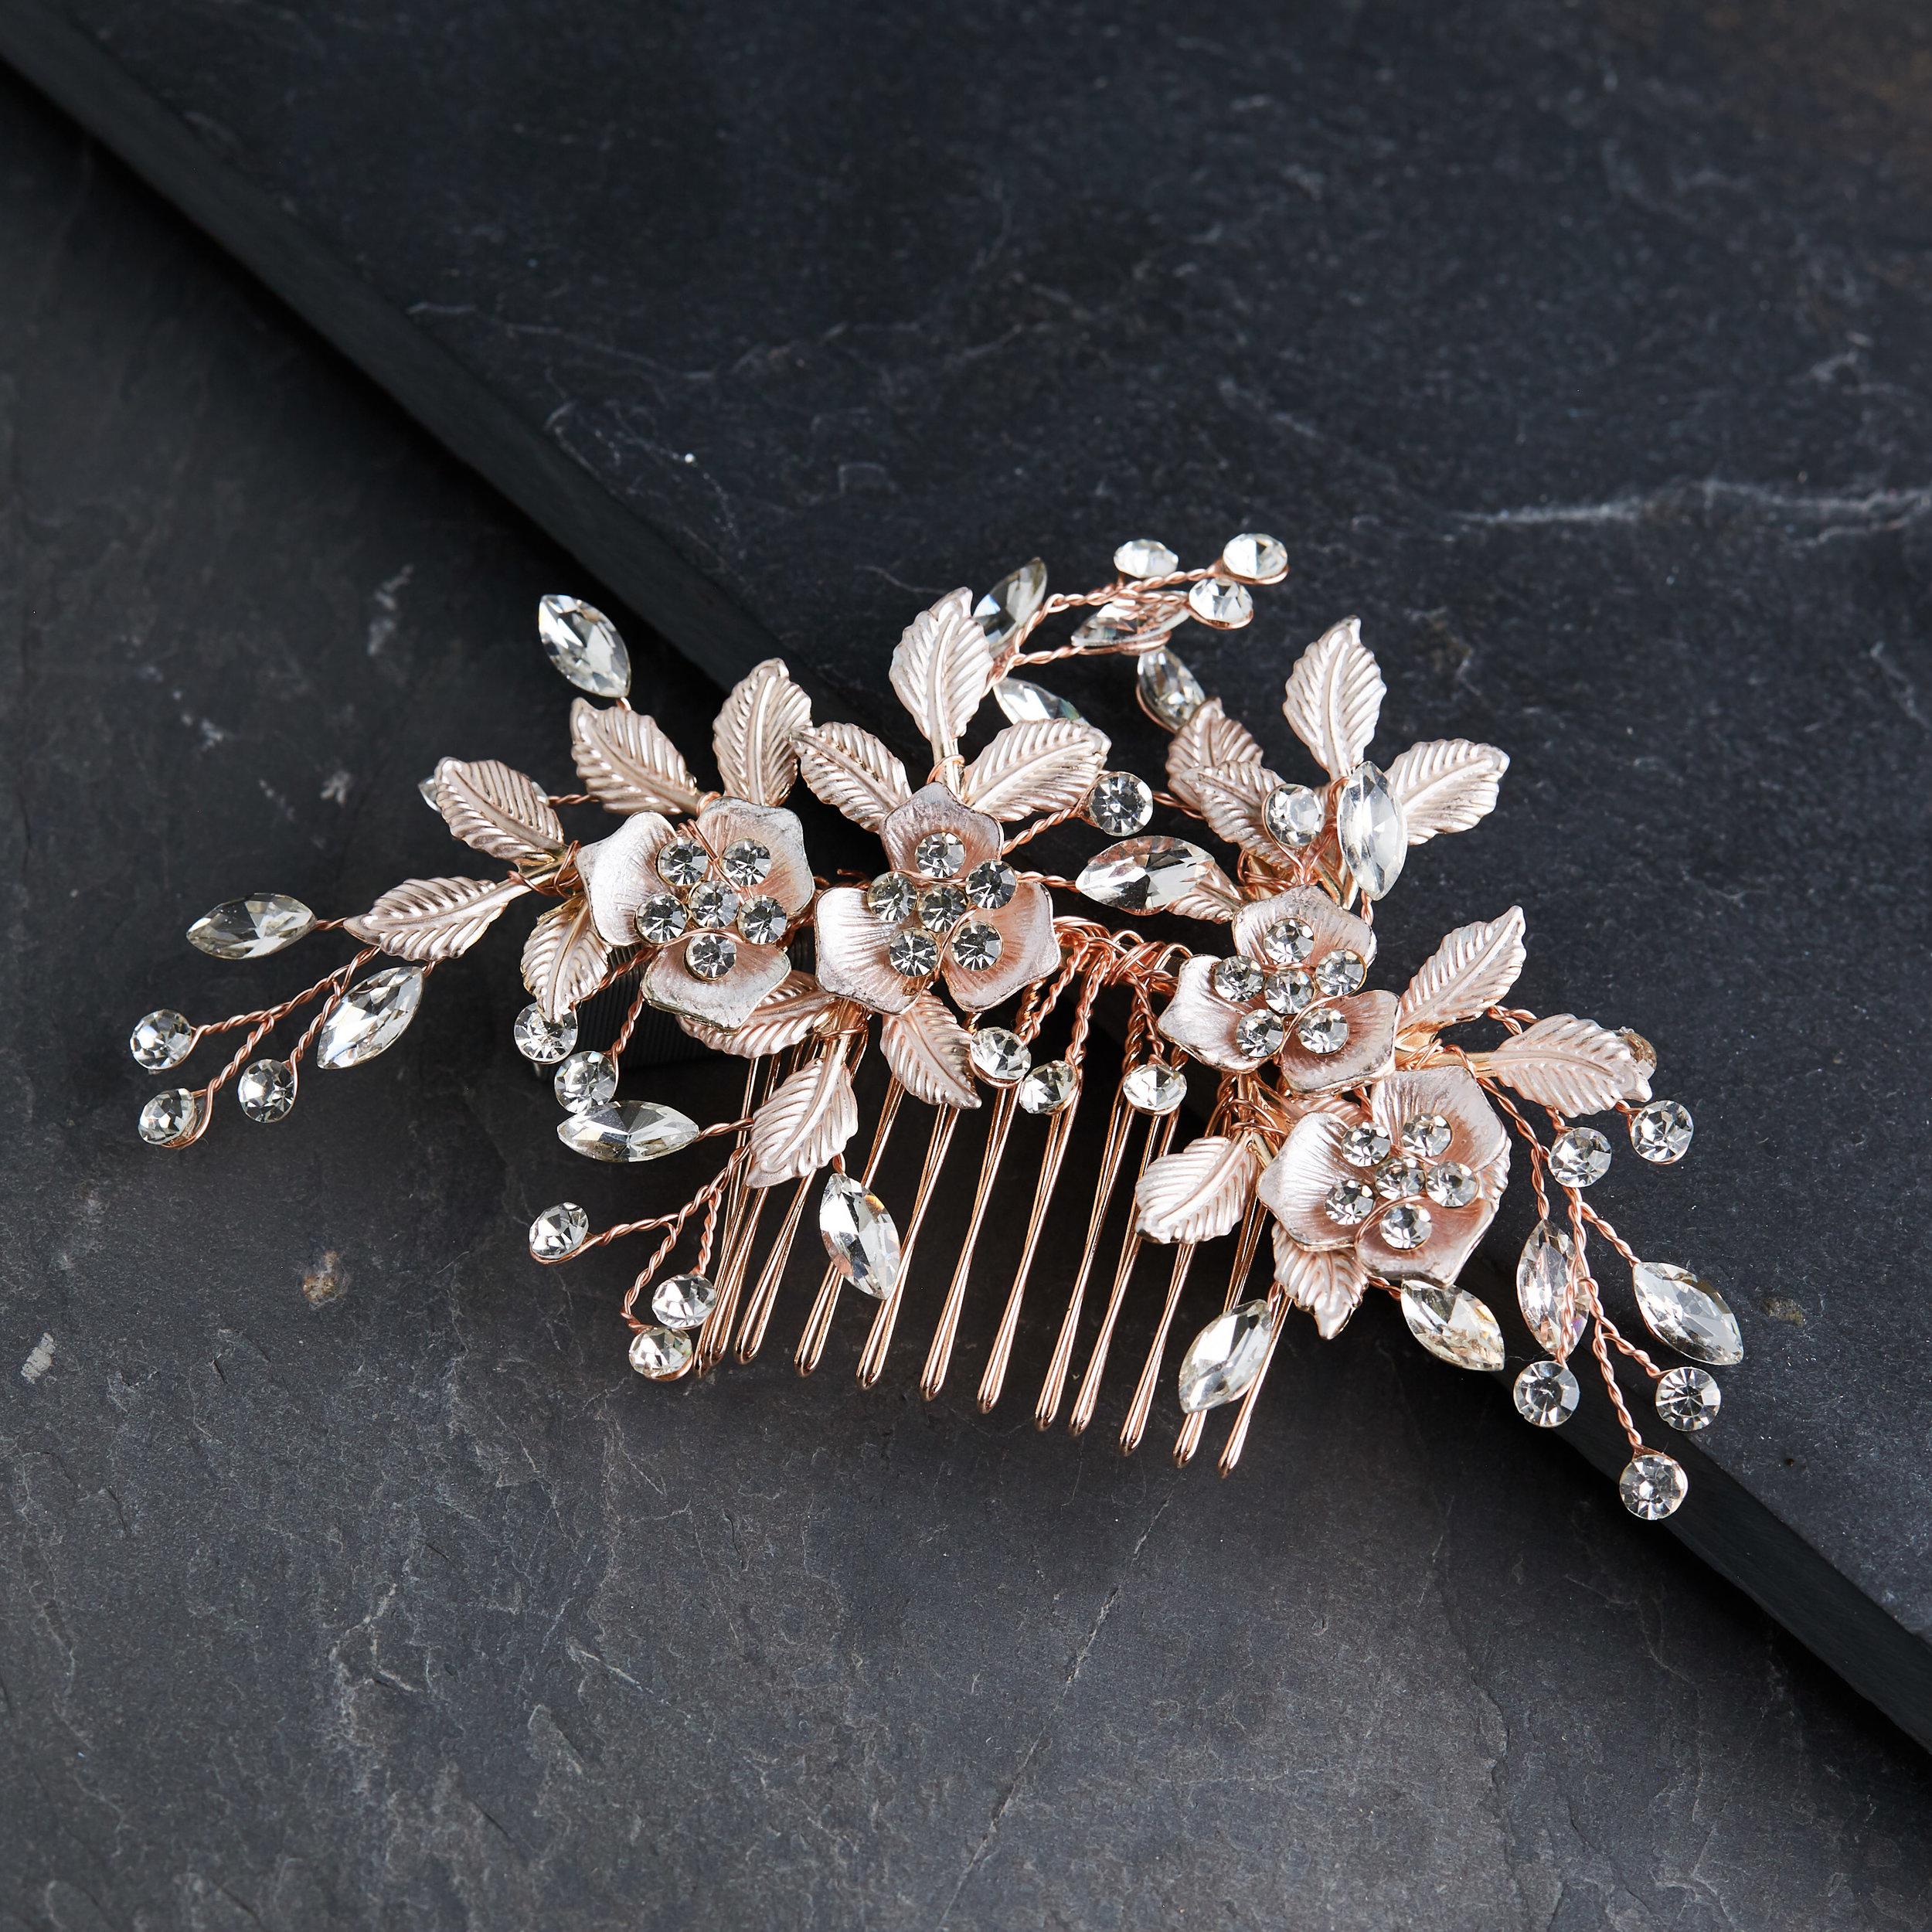 Rose Gold Rhinestone Floral Bridal Hair Comb Behind The Seams Bridal